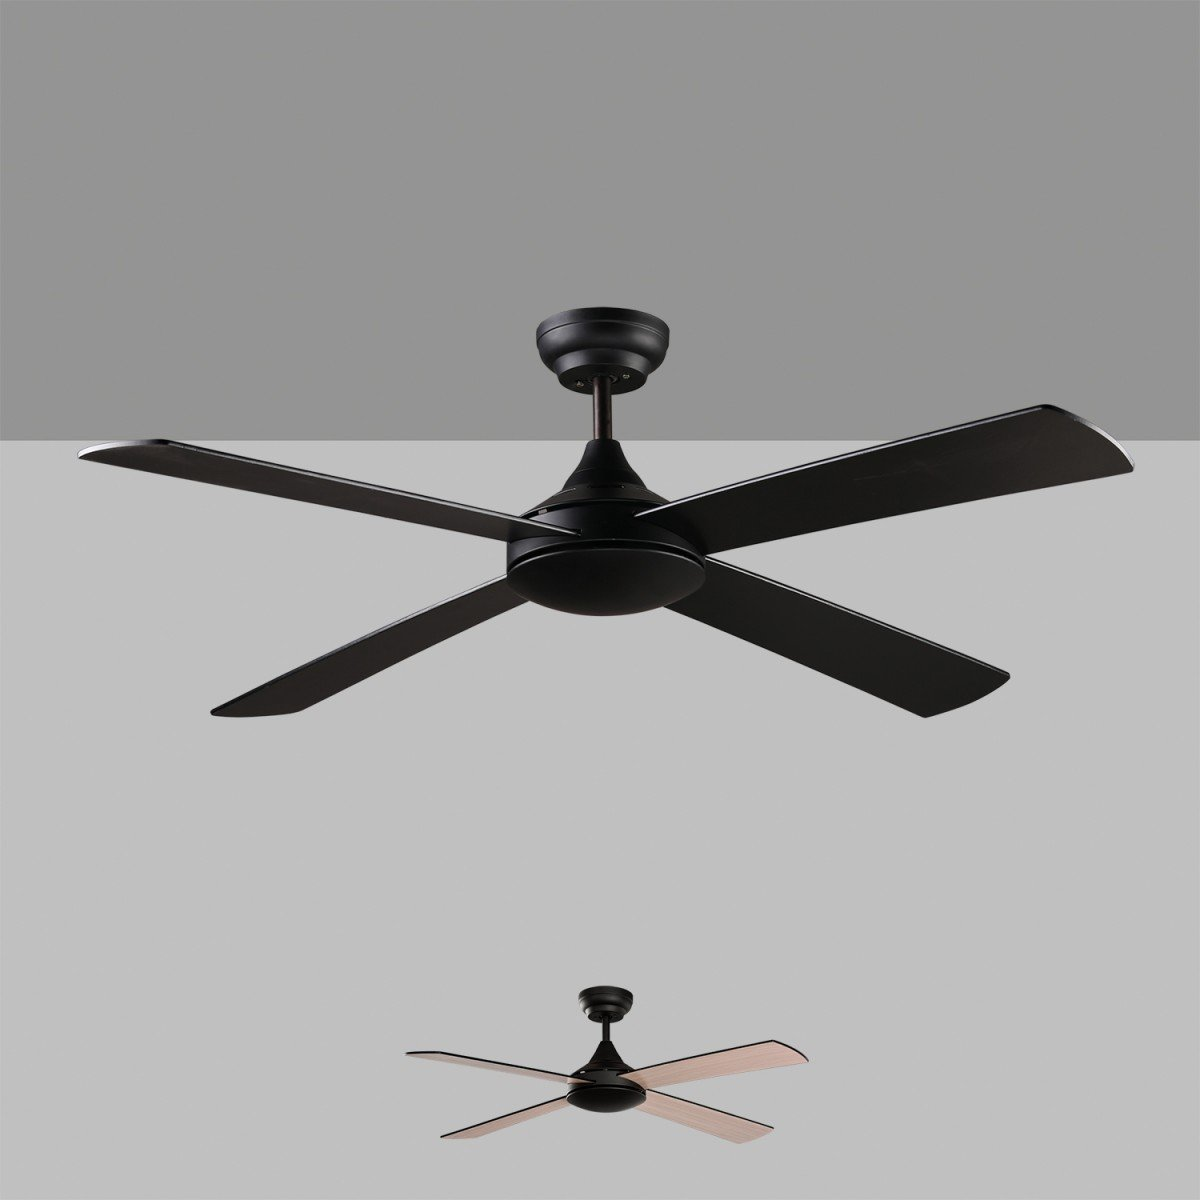 Ventilador Negro sin luz Raki 132cm V250452XN Acb